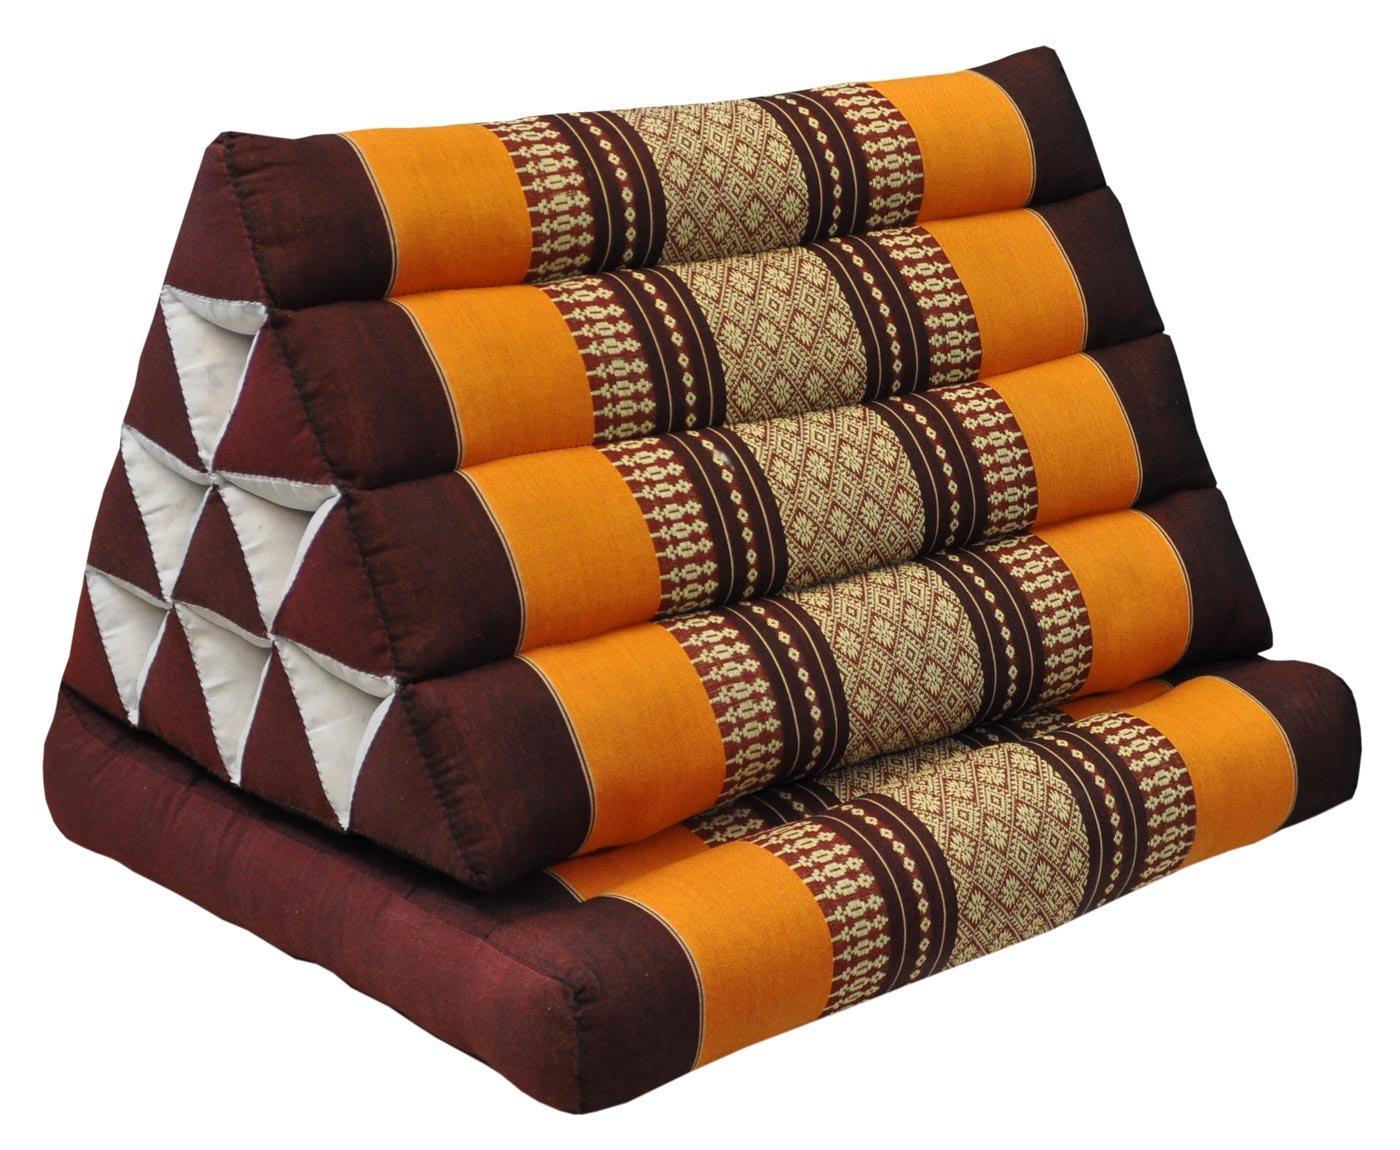 Thai triangle cushion with 1 folding seat, brown/orange, relaxation, beach, pool, meditation, yoga, (81101) by Wilai GmbH